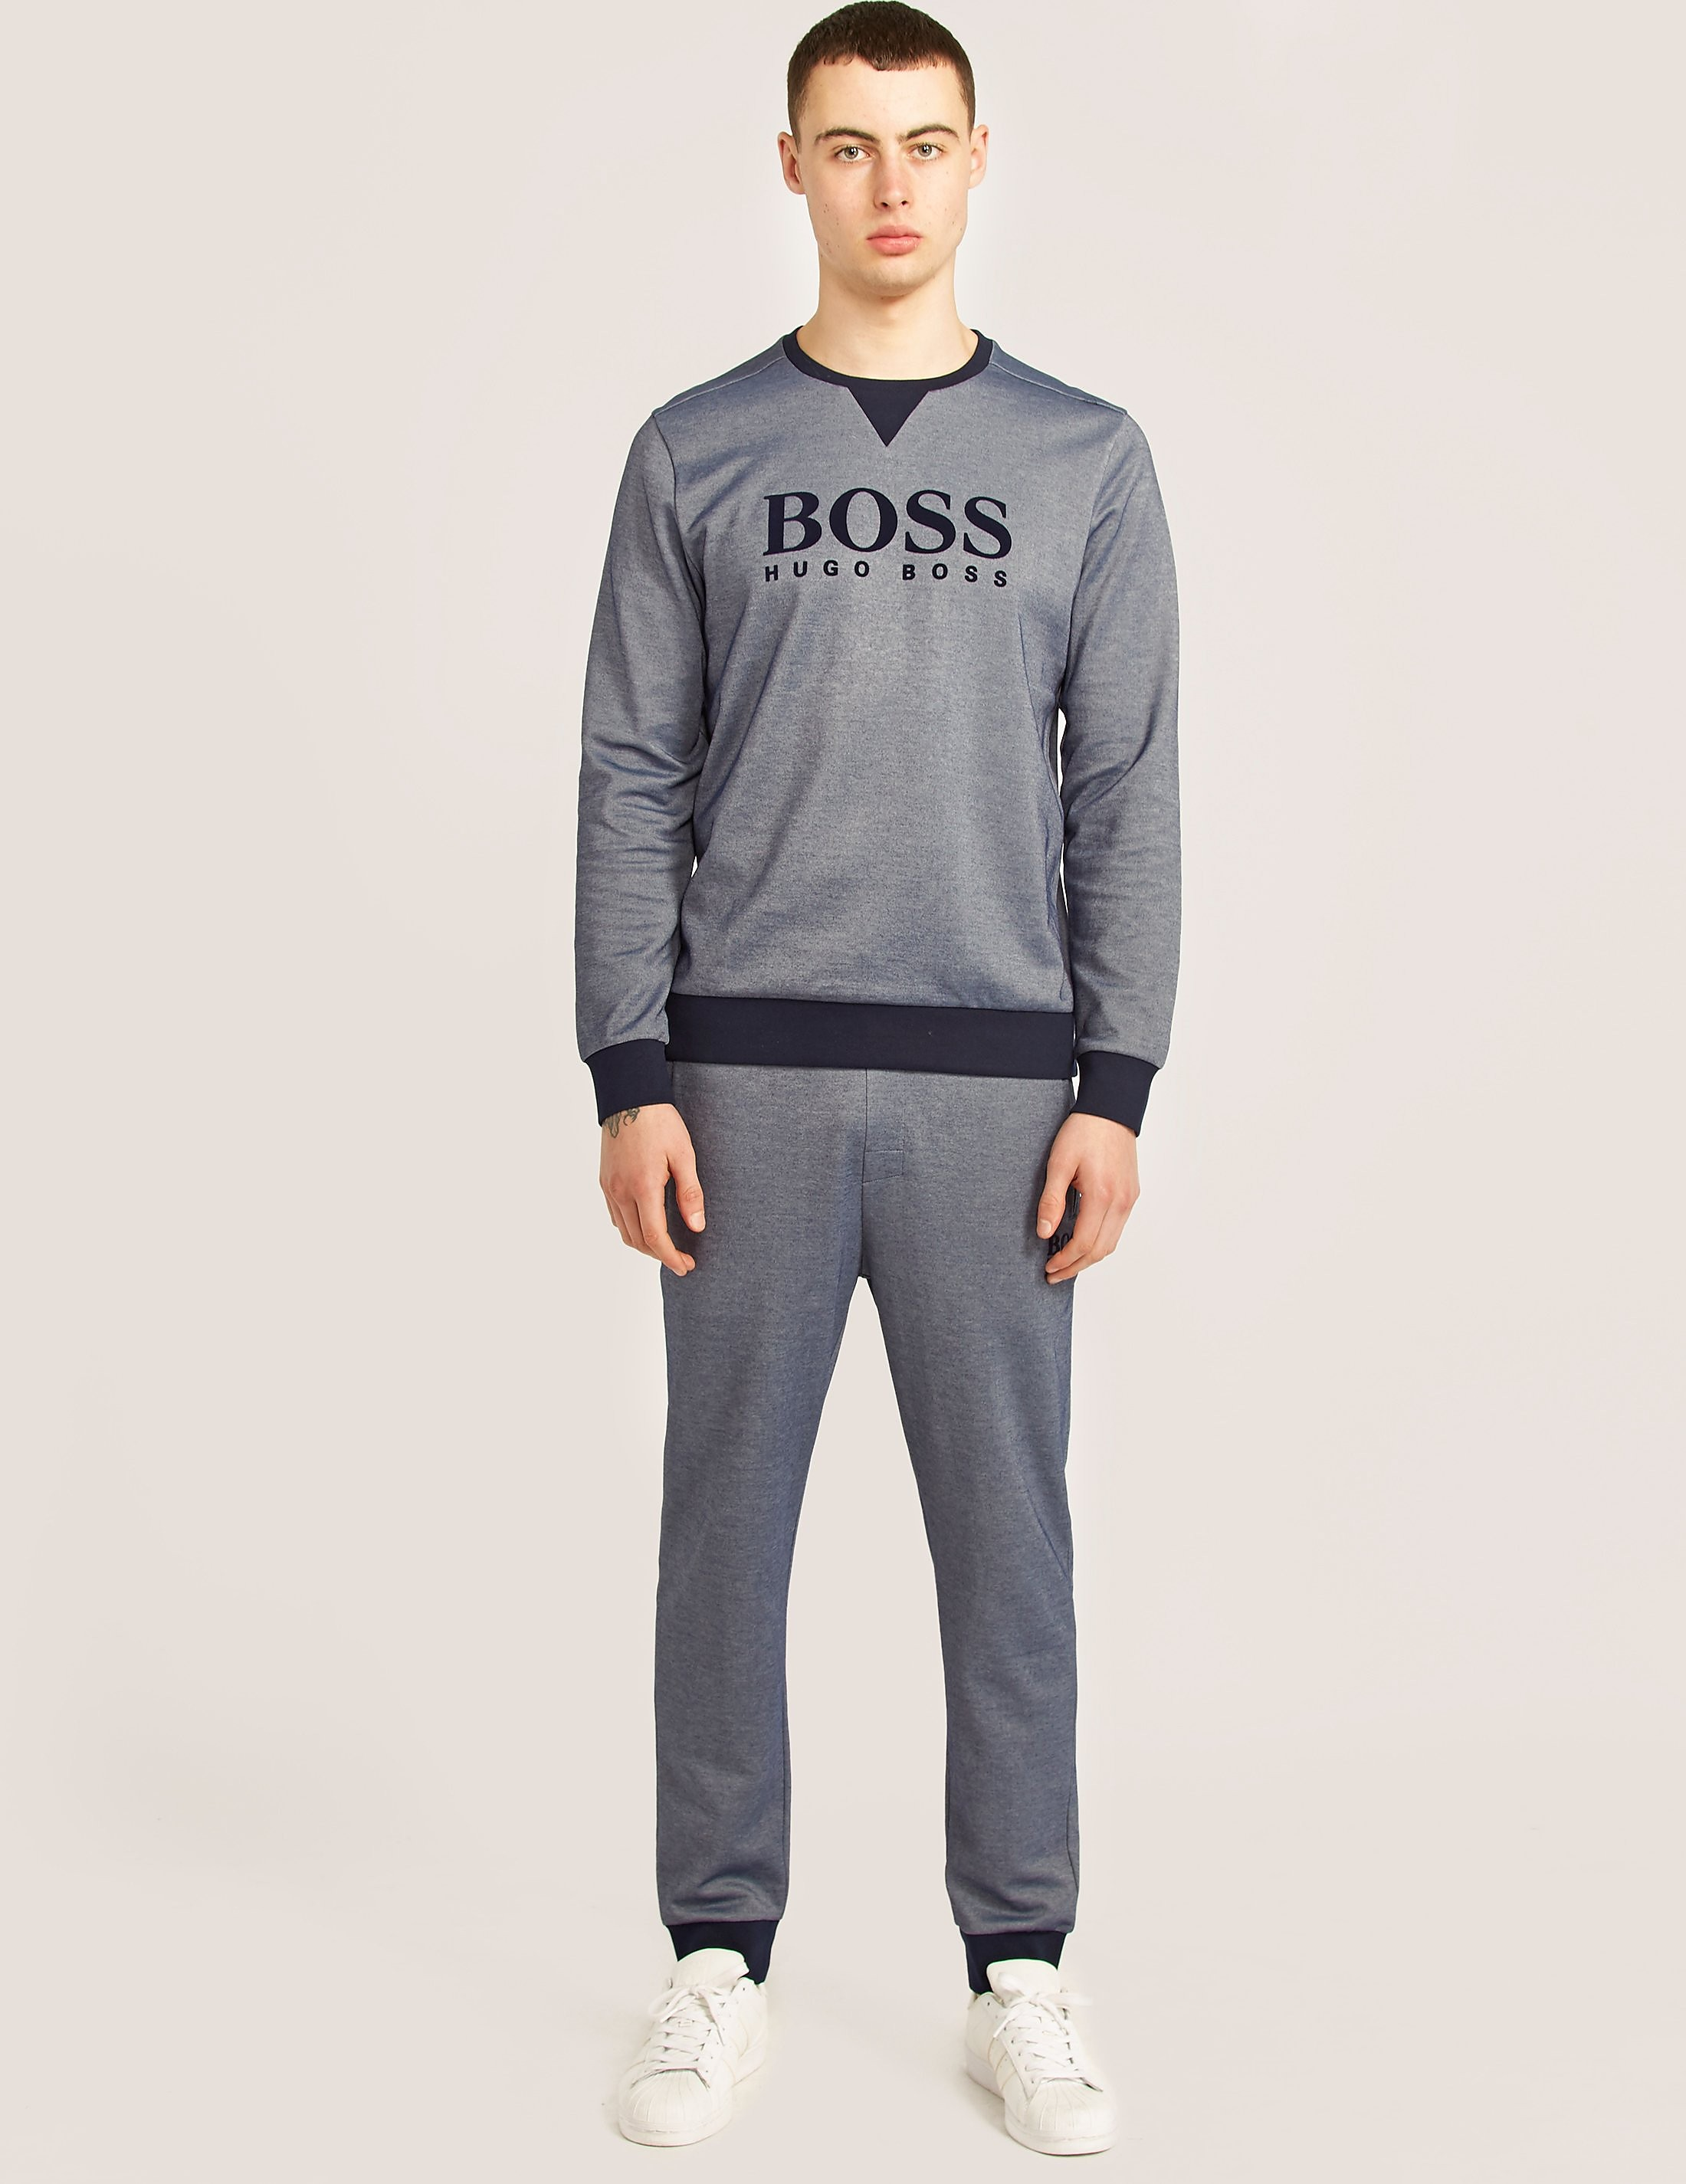 BOSS Cuff Trackpants